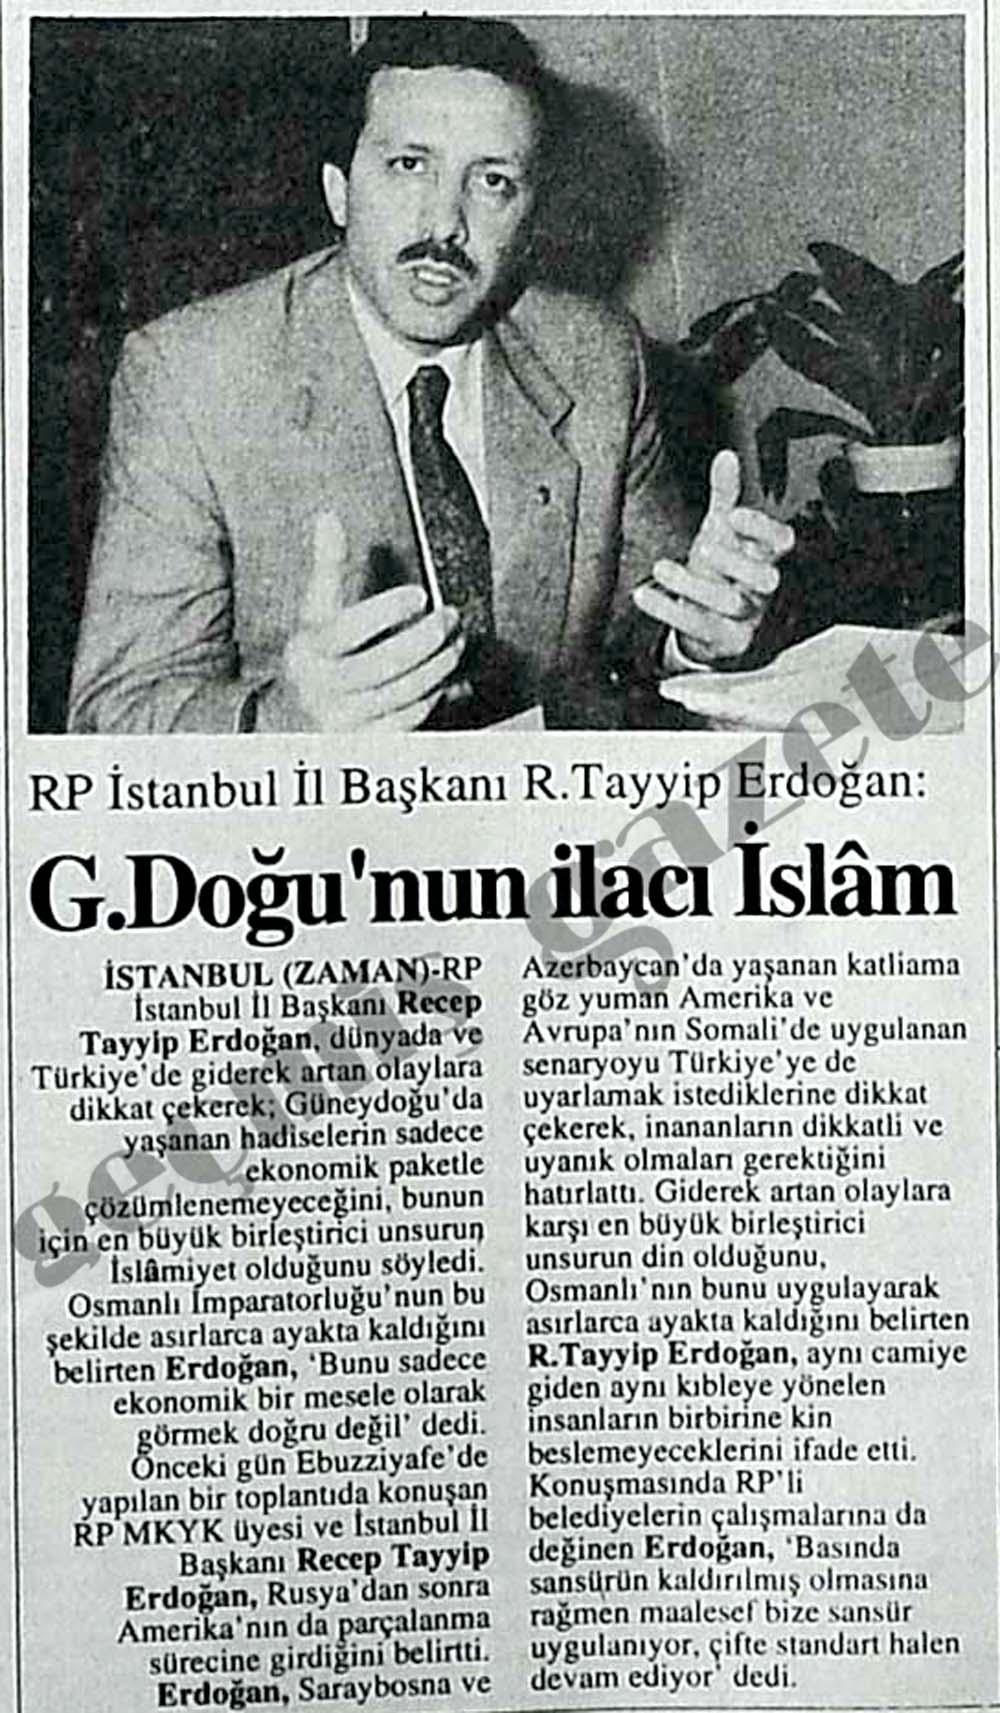 RP İstanbul İl Başkanı R. Tayyip Erdoğan: G. Doğu'nun ilacı İslam